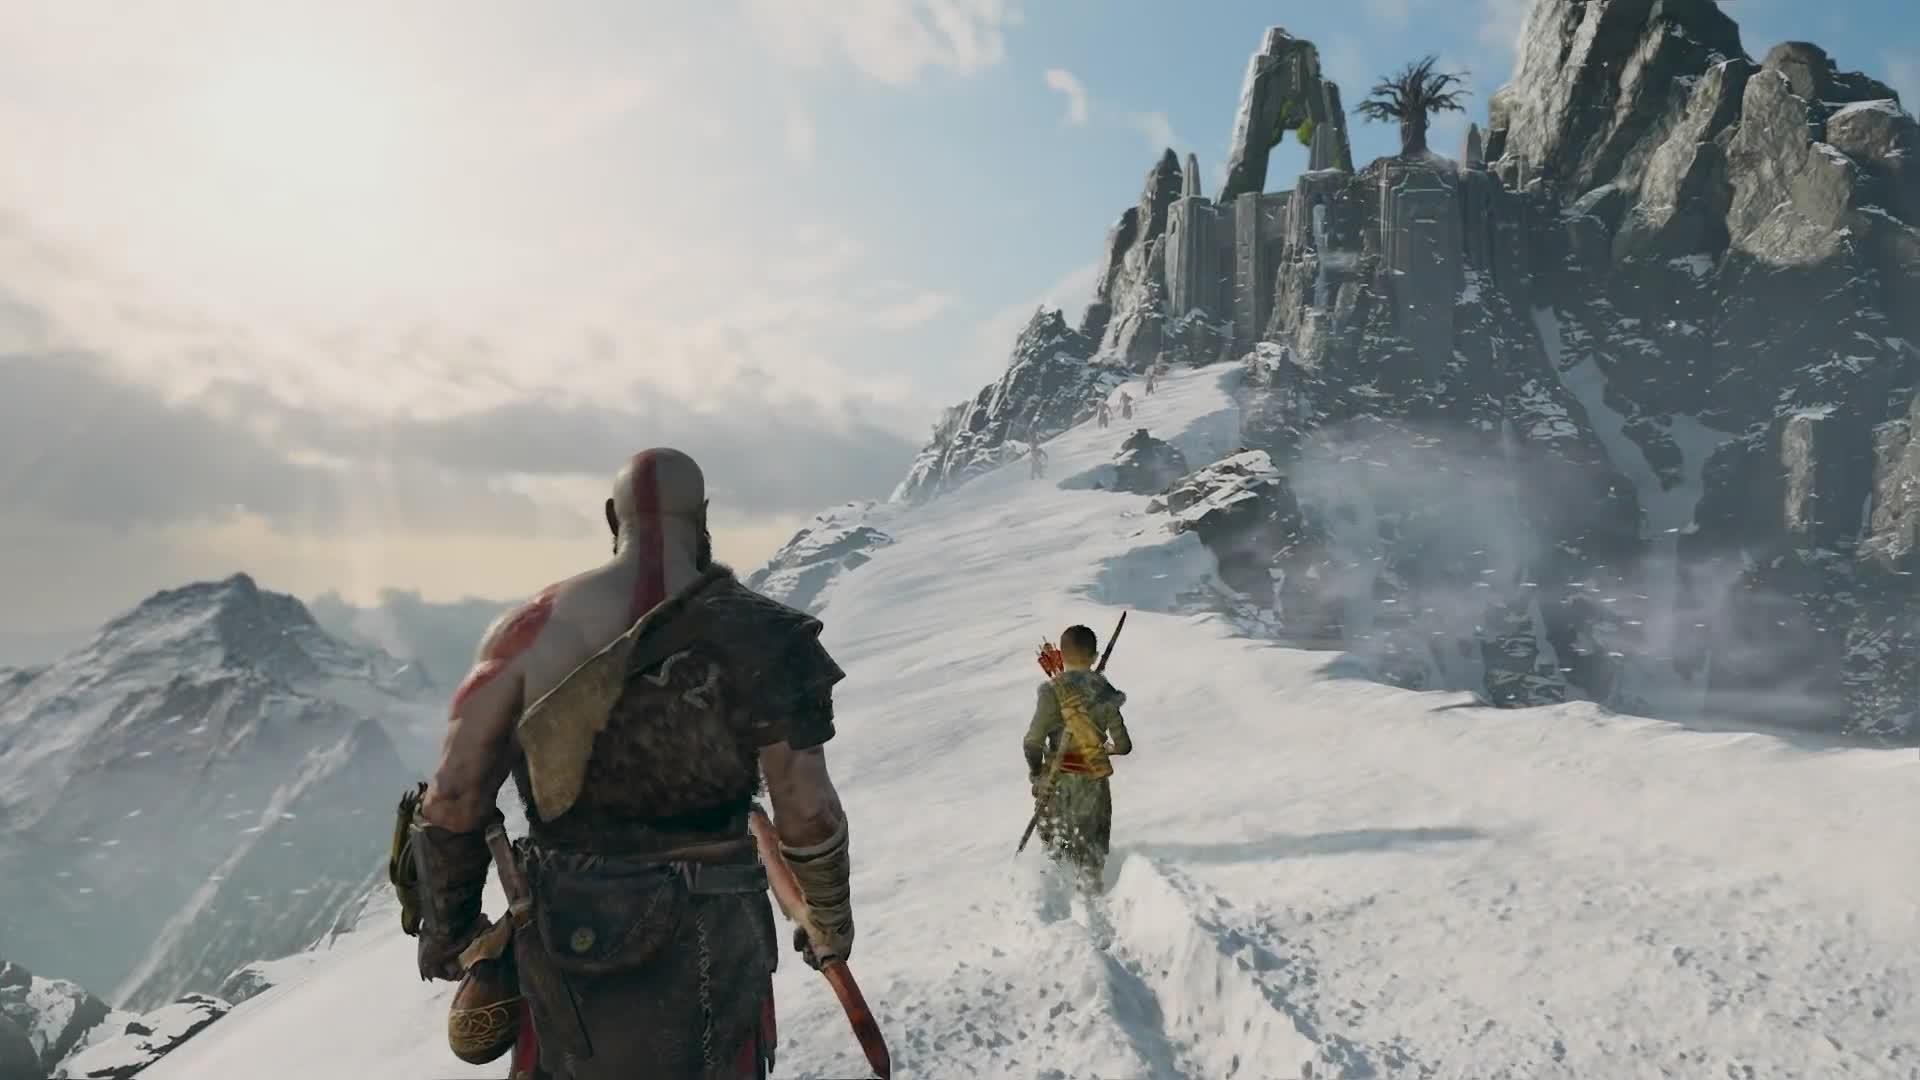 Cory Barlog, Creature, E3, E3 2017, Gameplay, God of War, Incredible, Kratos, Mythology, Norse, God of War - Be A Warrior: PS4 Gameplay Trailer | E3 2017 GIFs